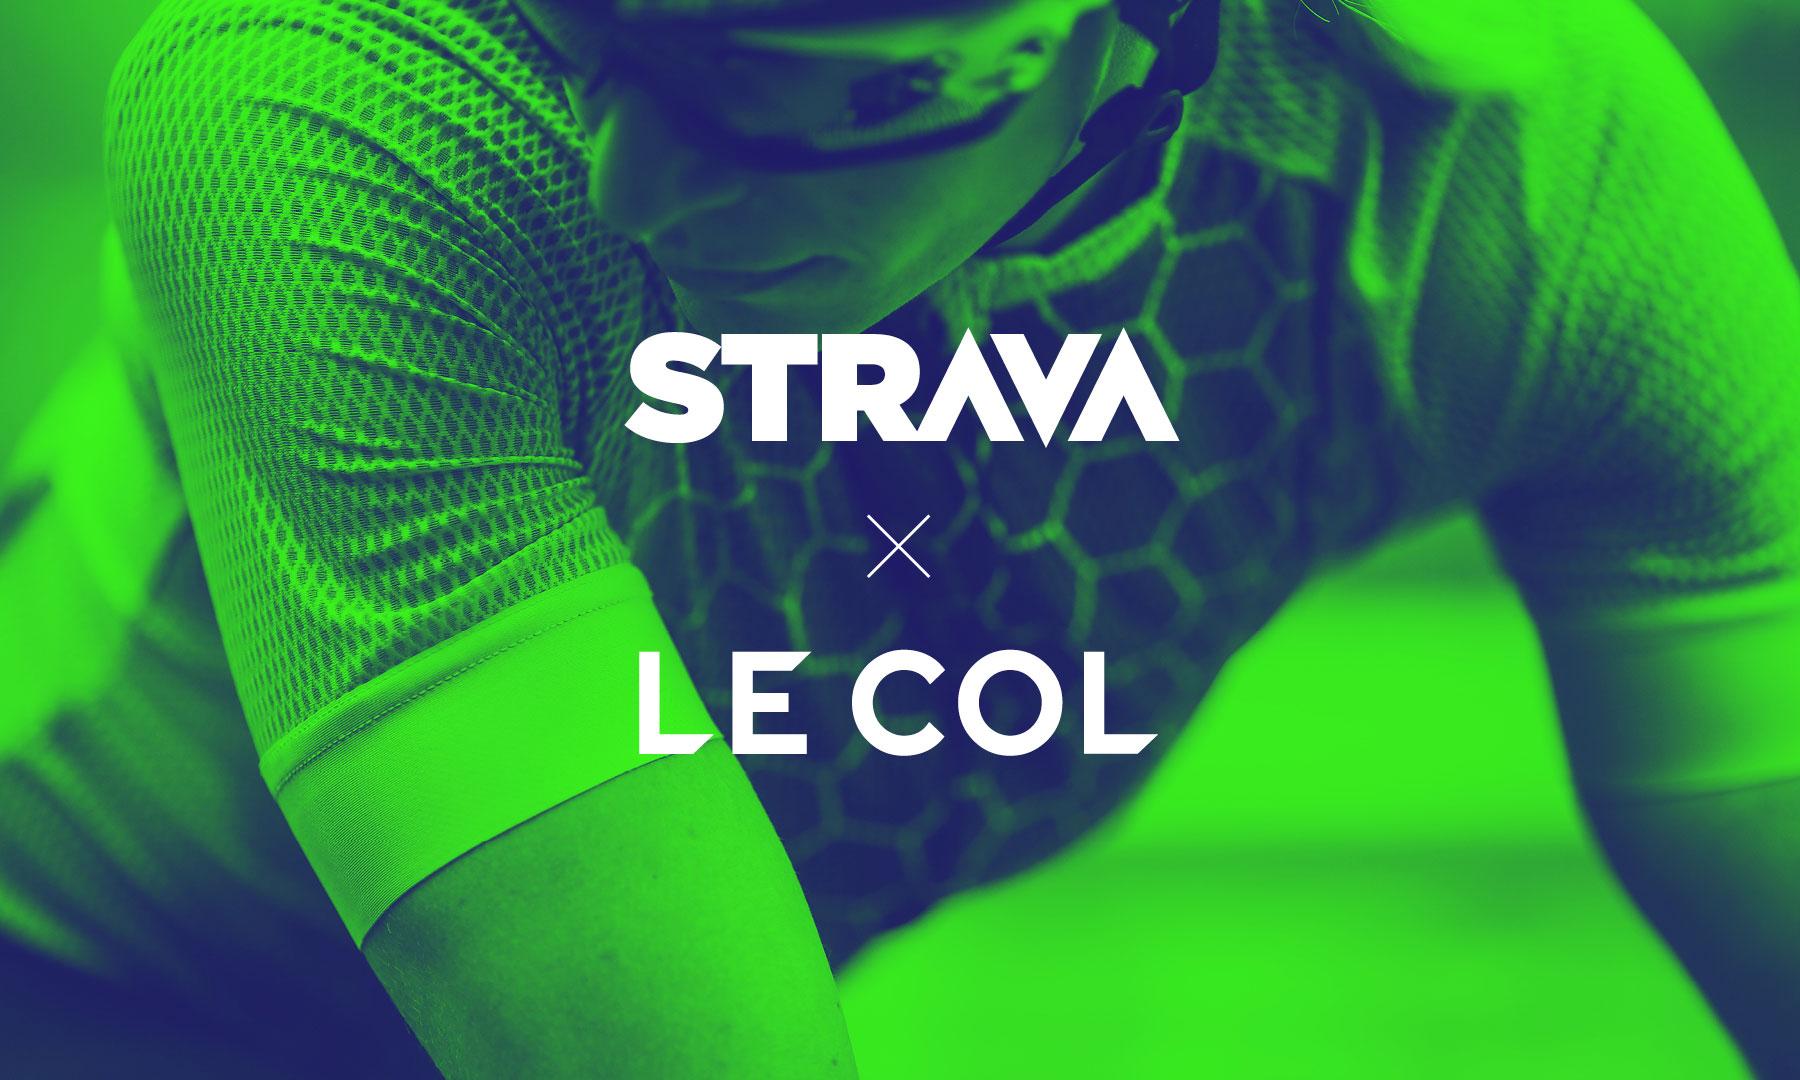 Strava_x_LeCol